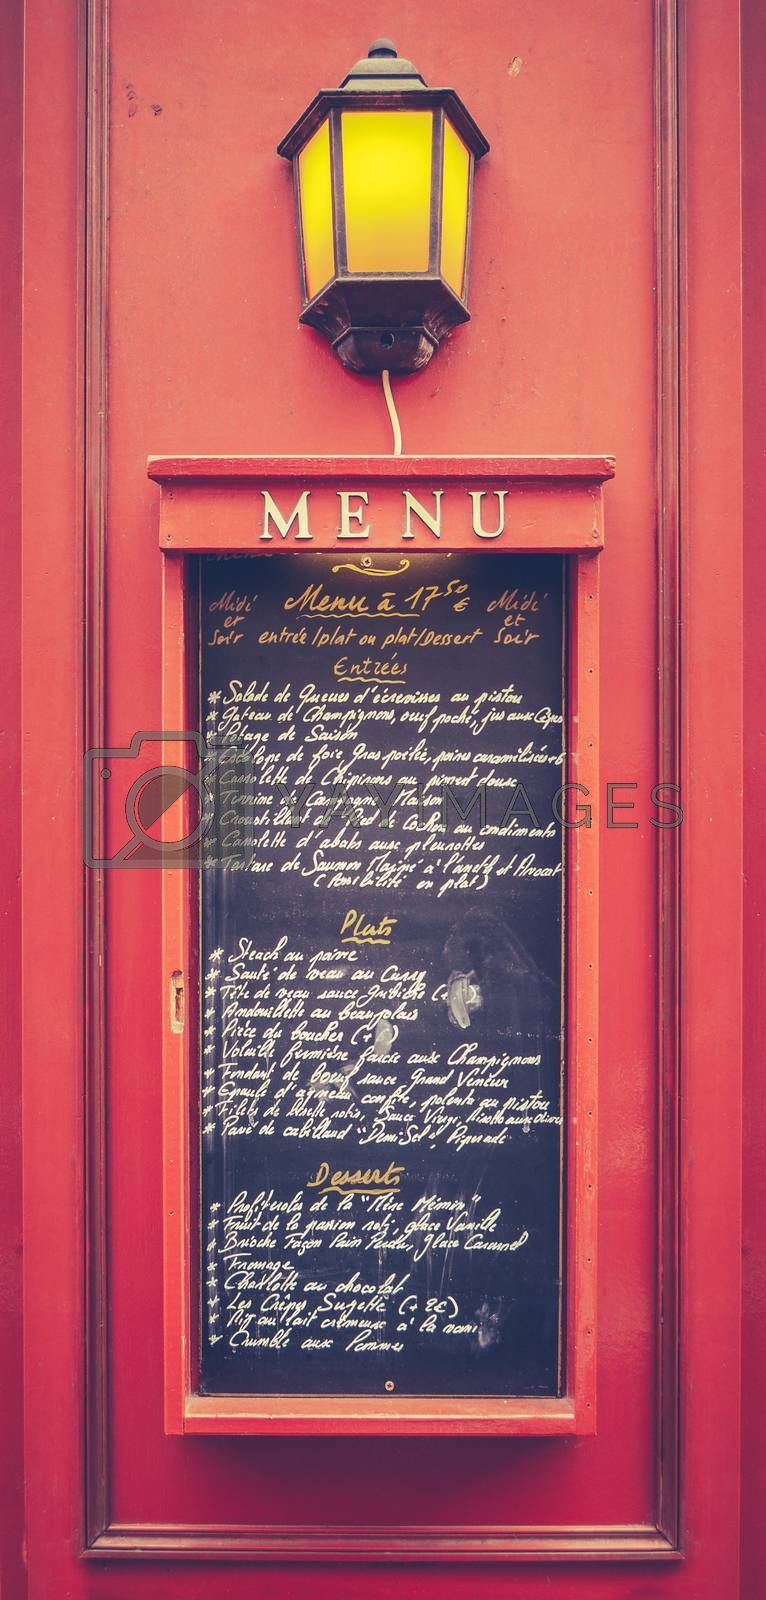 Royalty free image of Retro Paris Restaurant Menu by mrdoomits